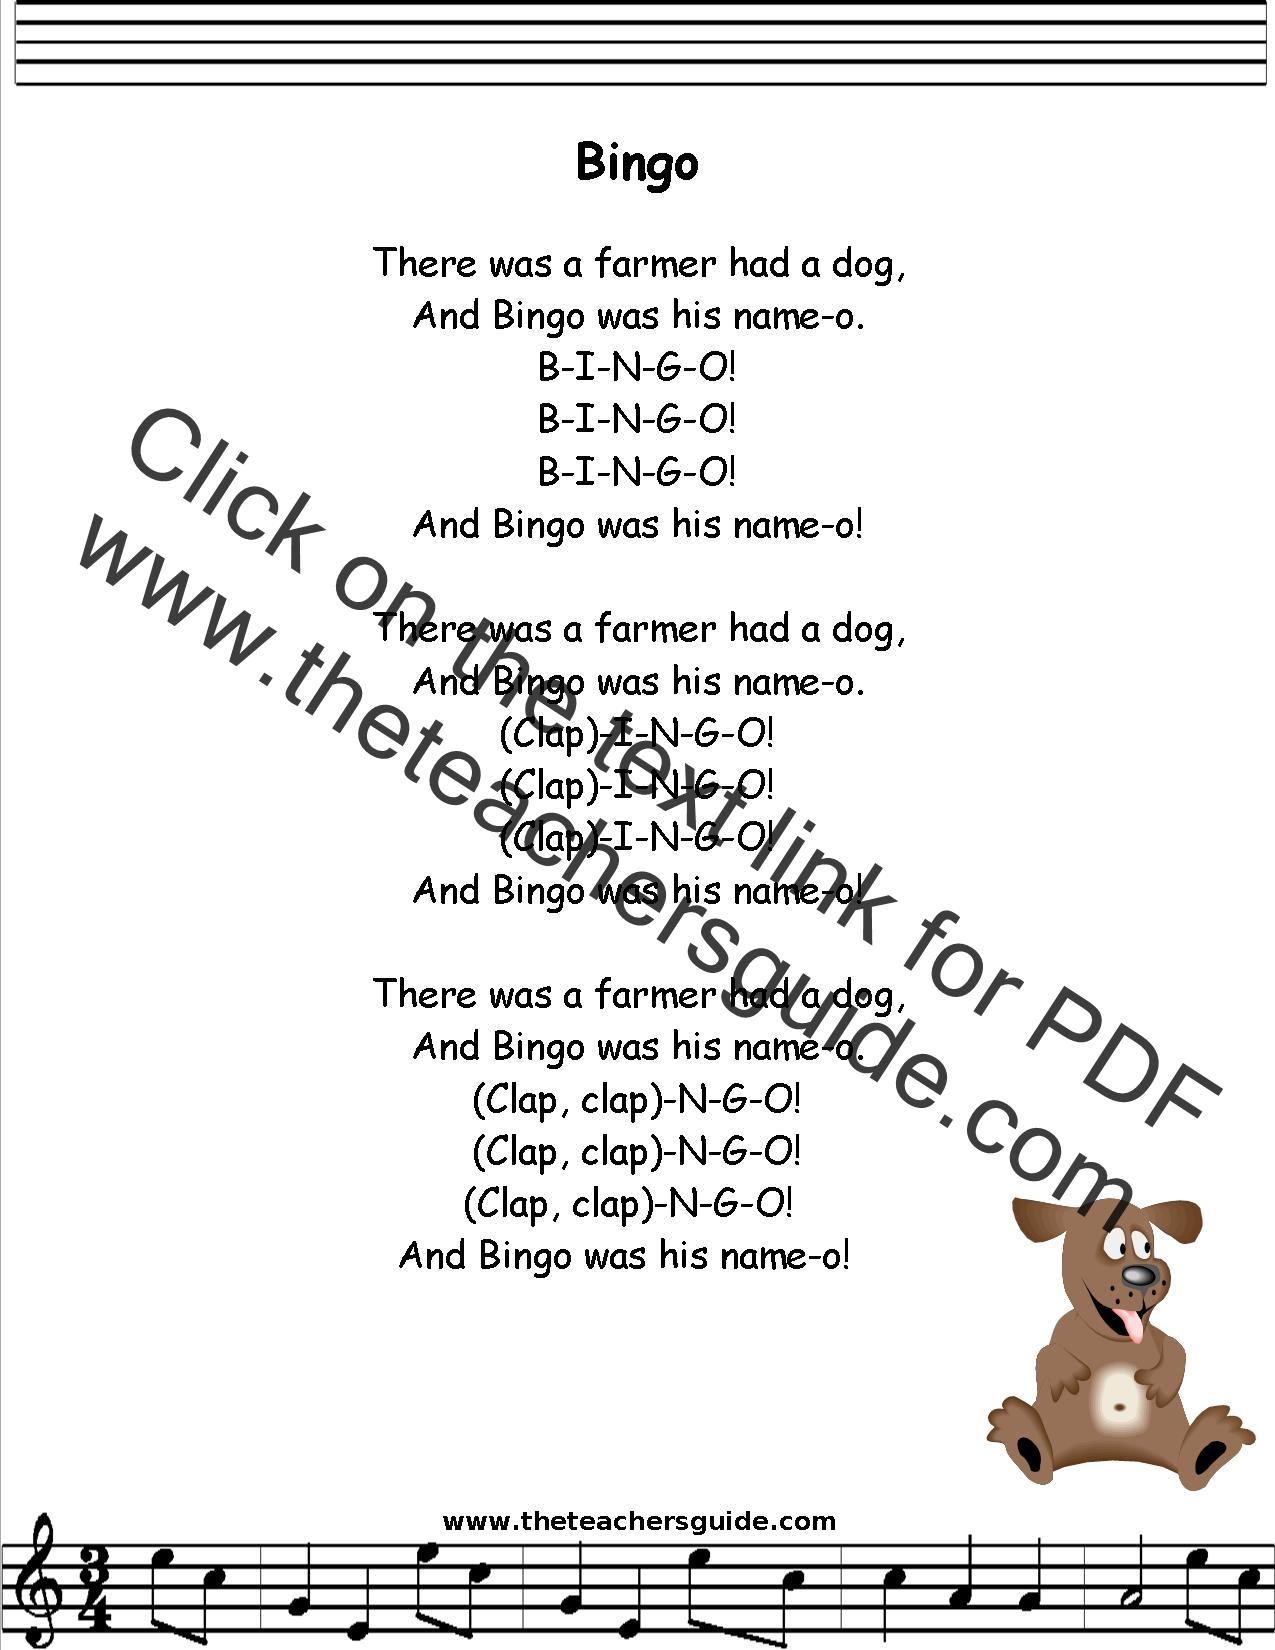 NURSERY RHYMES : Bingo - Dog Song lyrics